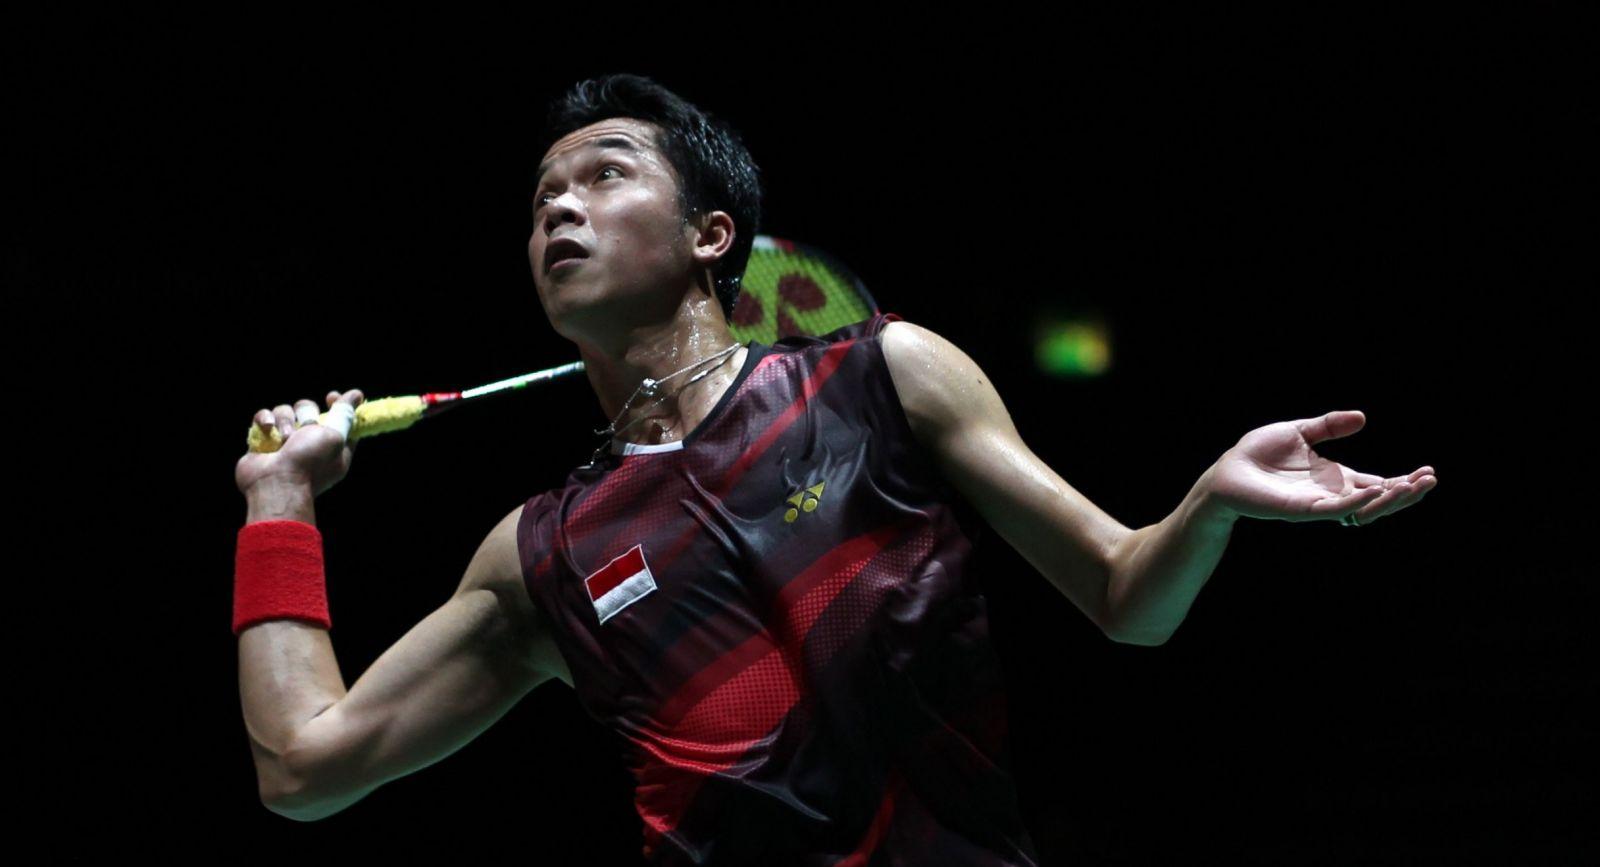 Media Malaysia mengakui kehebatan dari legenda bulu tangkis Indonesia, Taufik Hidayat, dan mengasihani legendanya sendiri, Lee Chong Wei. (foto: BWF)